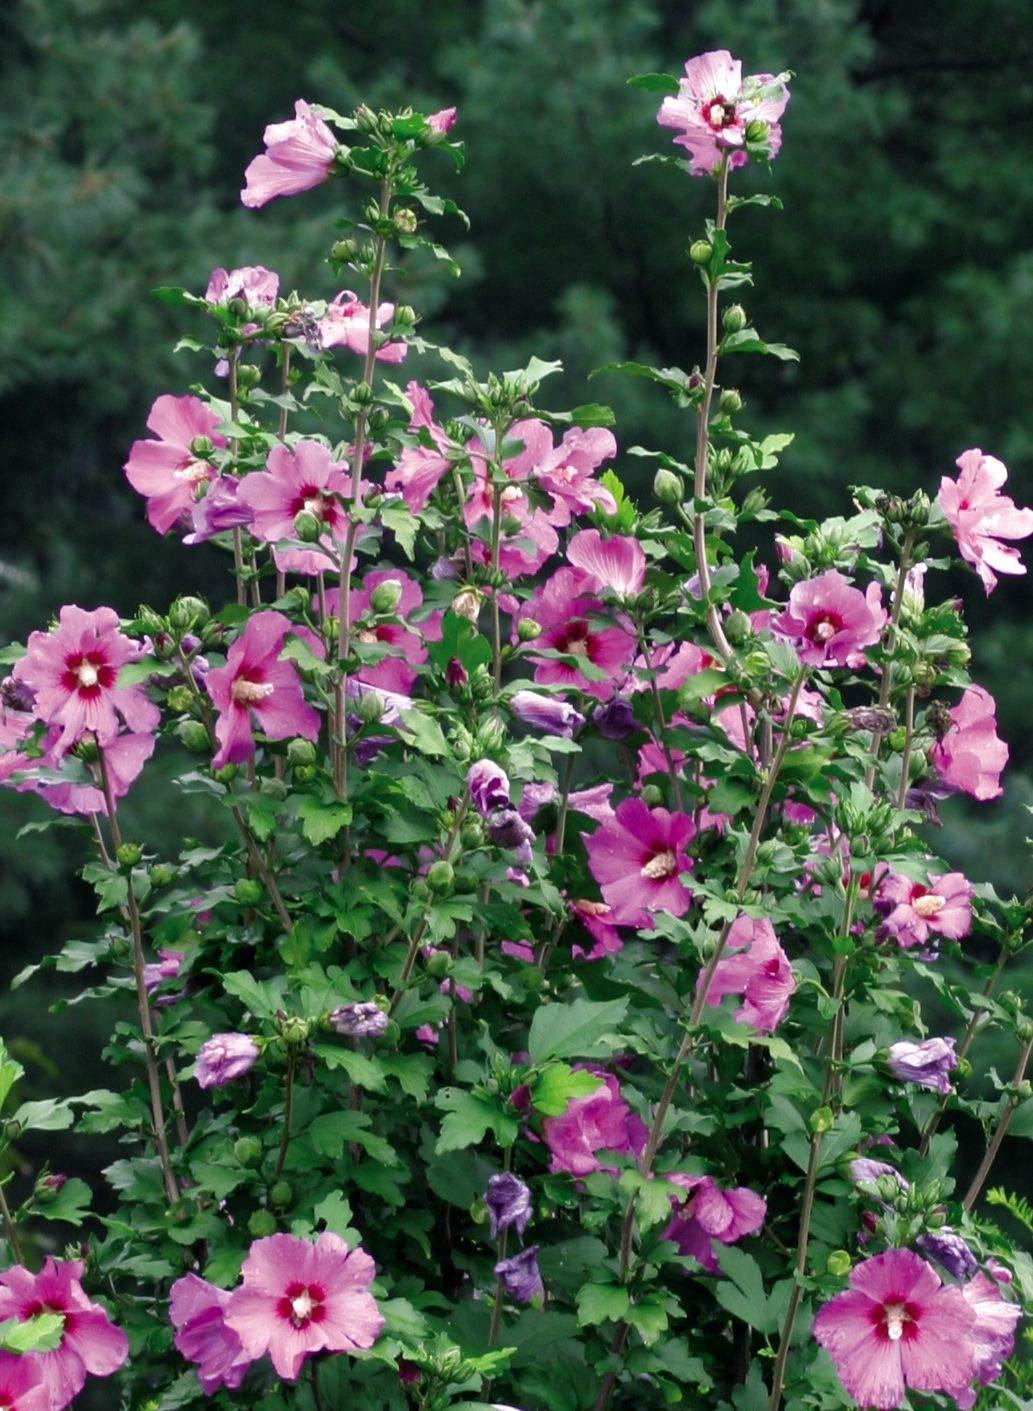 Hardy Hibiscus Plant Hibiscus syriacus Lavender Chiffon (Rose of Sharon) Shrub, Lavender Flowers, 1 Gallon Pot - Perennial